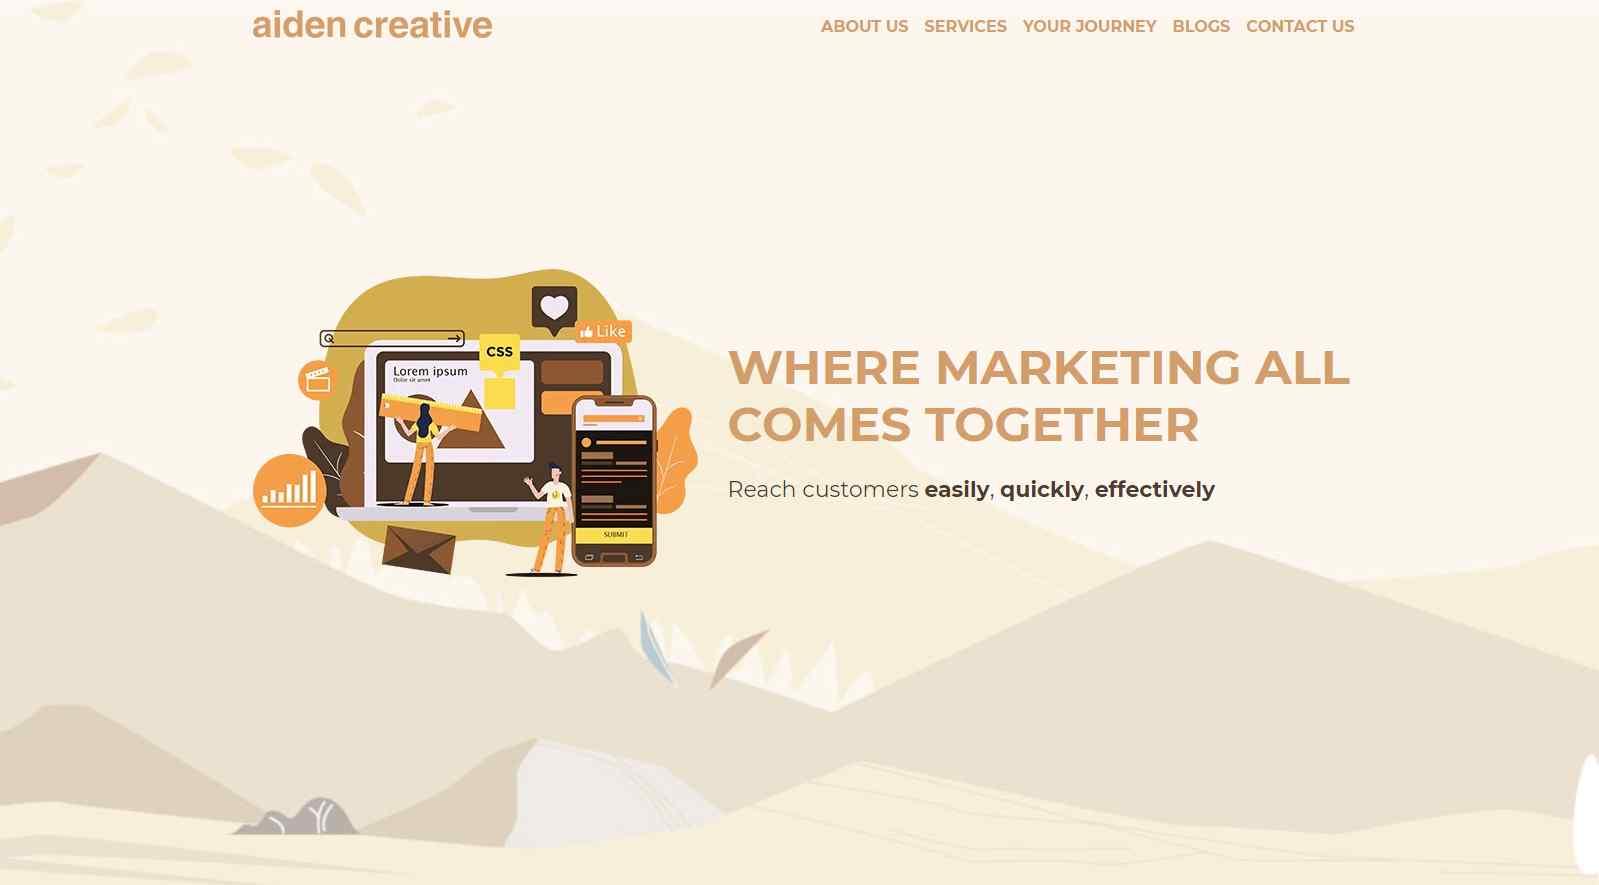 aiden creative 15 Top Facebook Marketing Agencies in Singapore